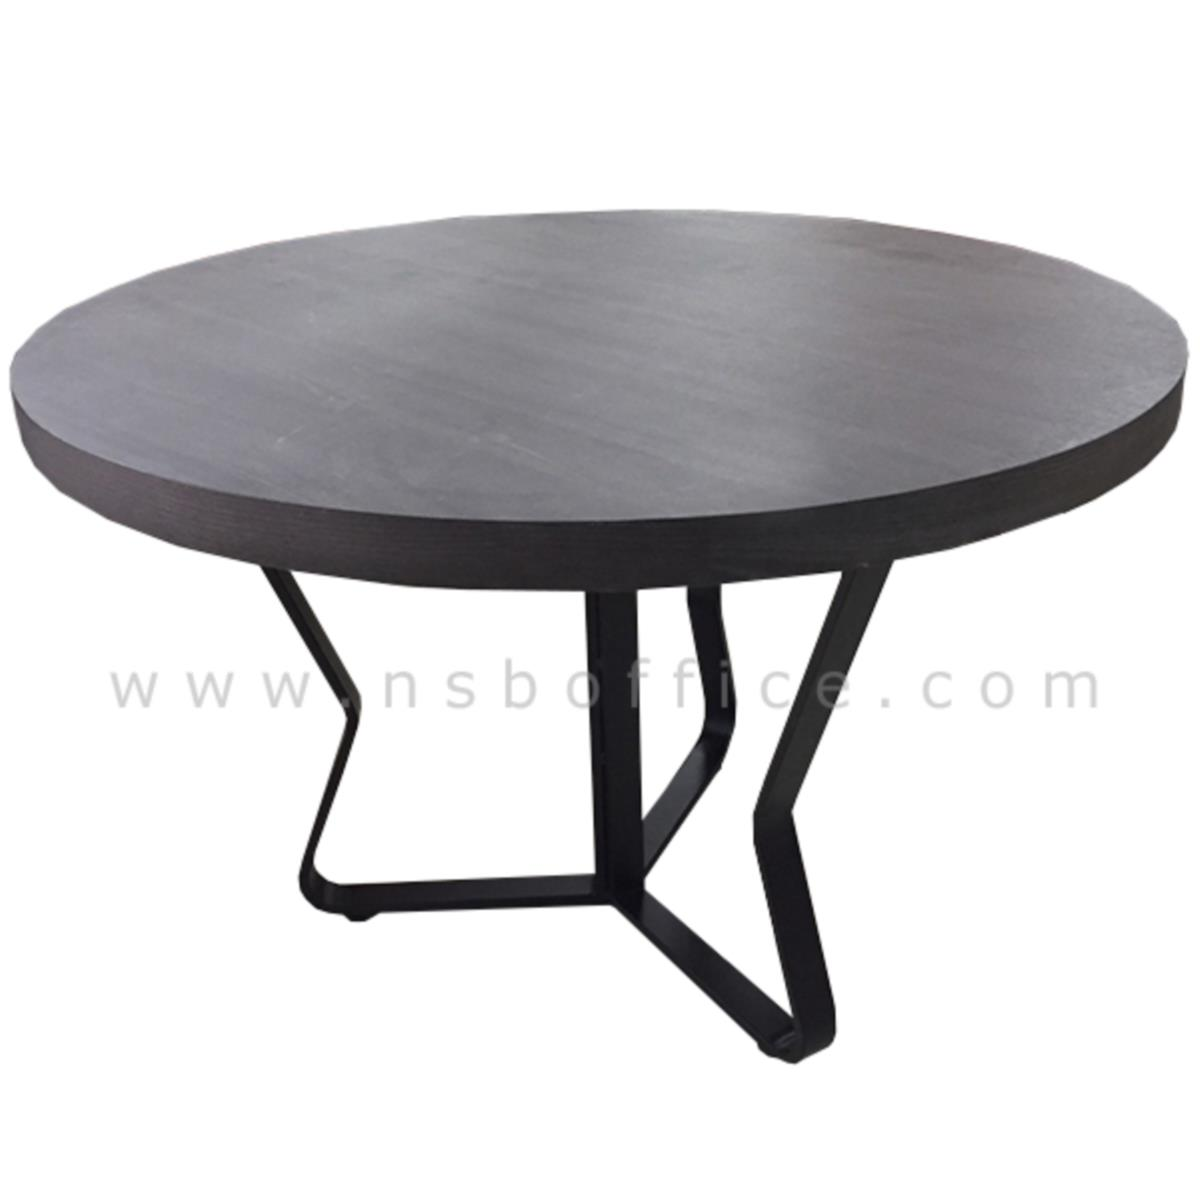 L10A183:โต๊ะประชุมกลม  ขนาด 120Di*79H cm. ขาเหล็กทรงแจกัน 3 ขา